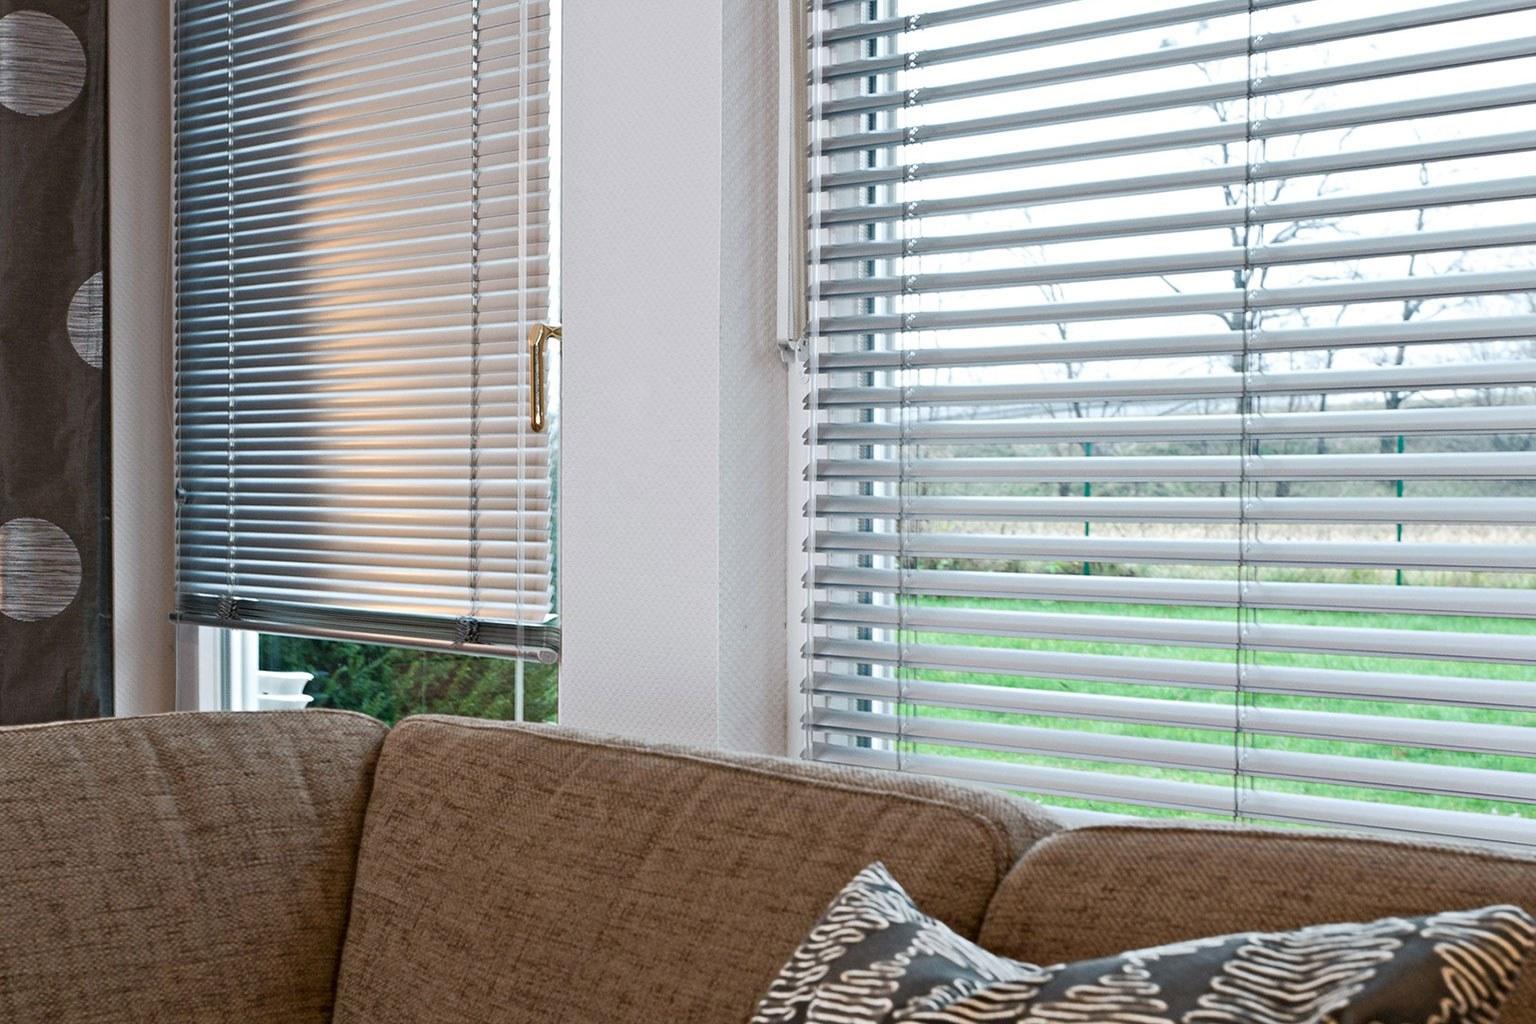 megaview tm jalousien jalousie mit doppelter sicht nach. Black Bedroom Furniture Sets. Home Design Ideas